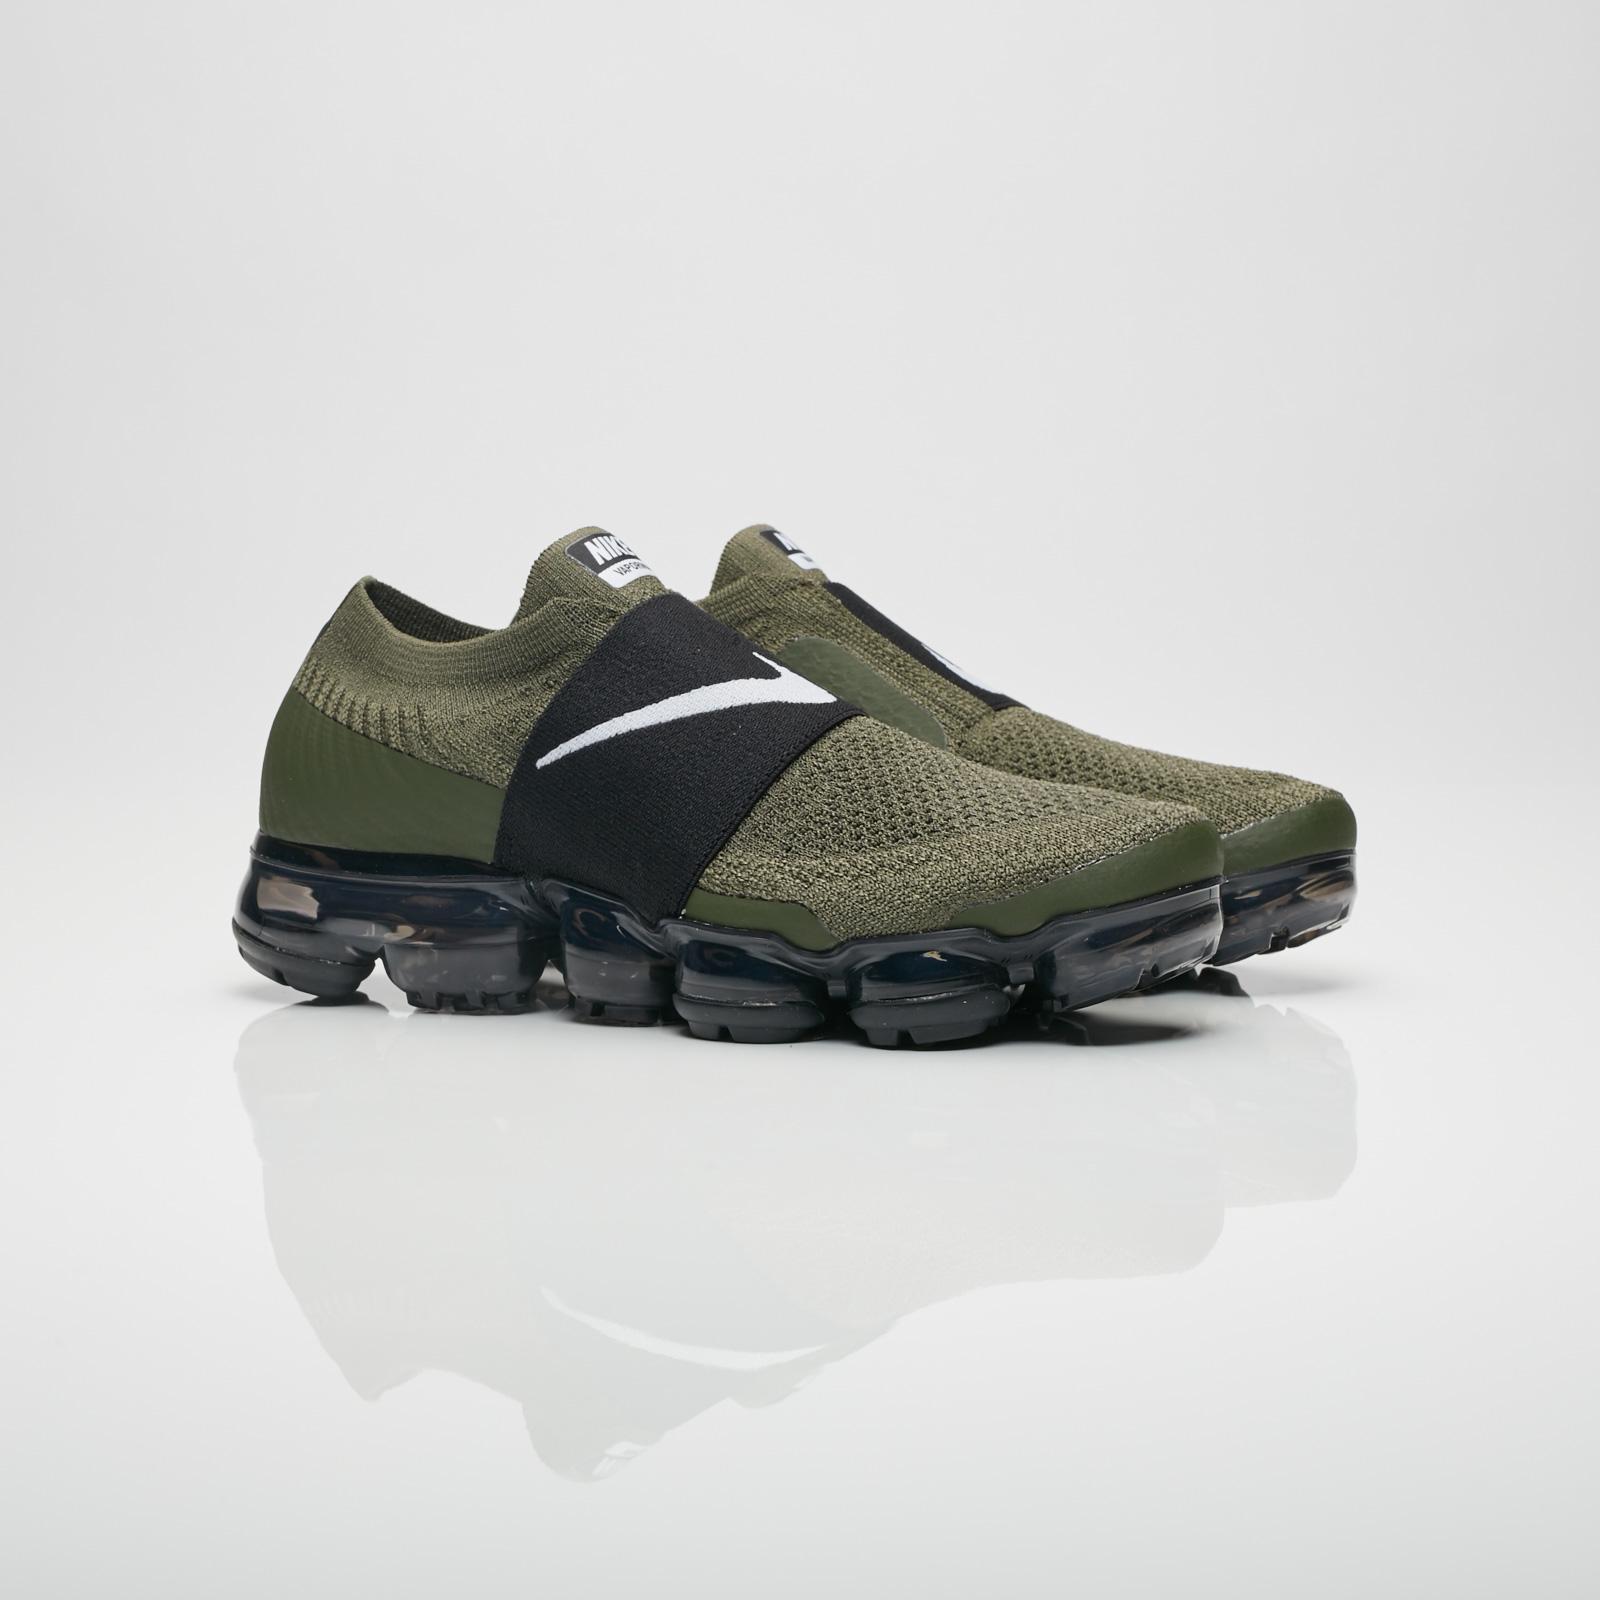 size 40 360c7 a3831 Nike Air Vapormax Flyknit Moc - Aa4155-300 - Sneakersnstuff ...